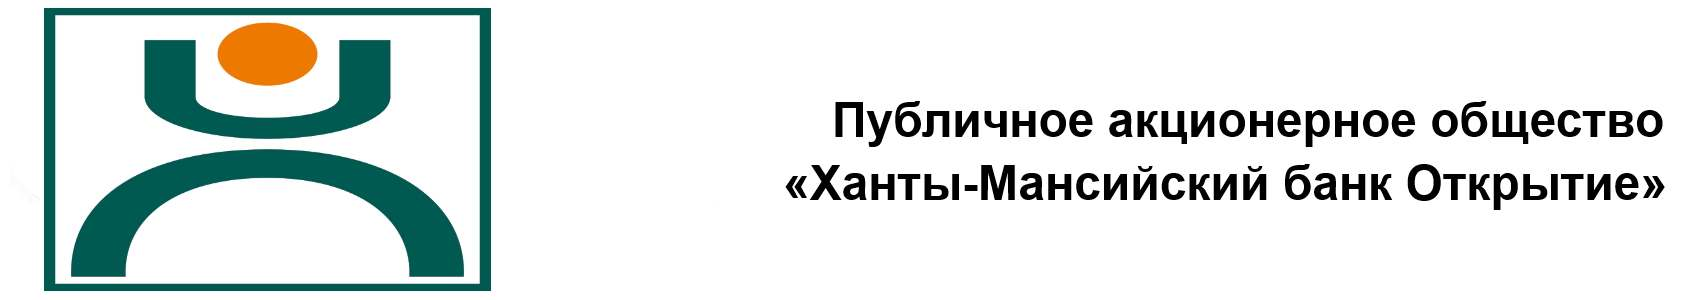 Ханты-Мансийский банк Открытие